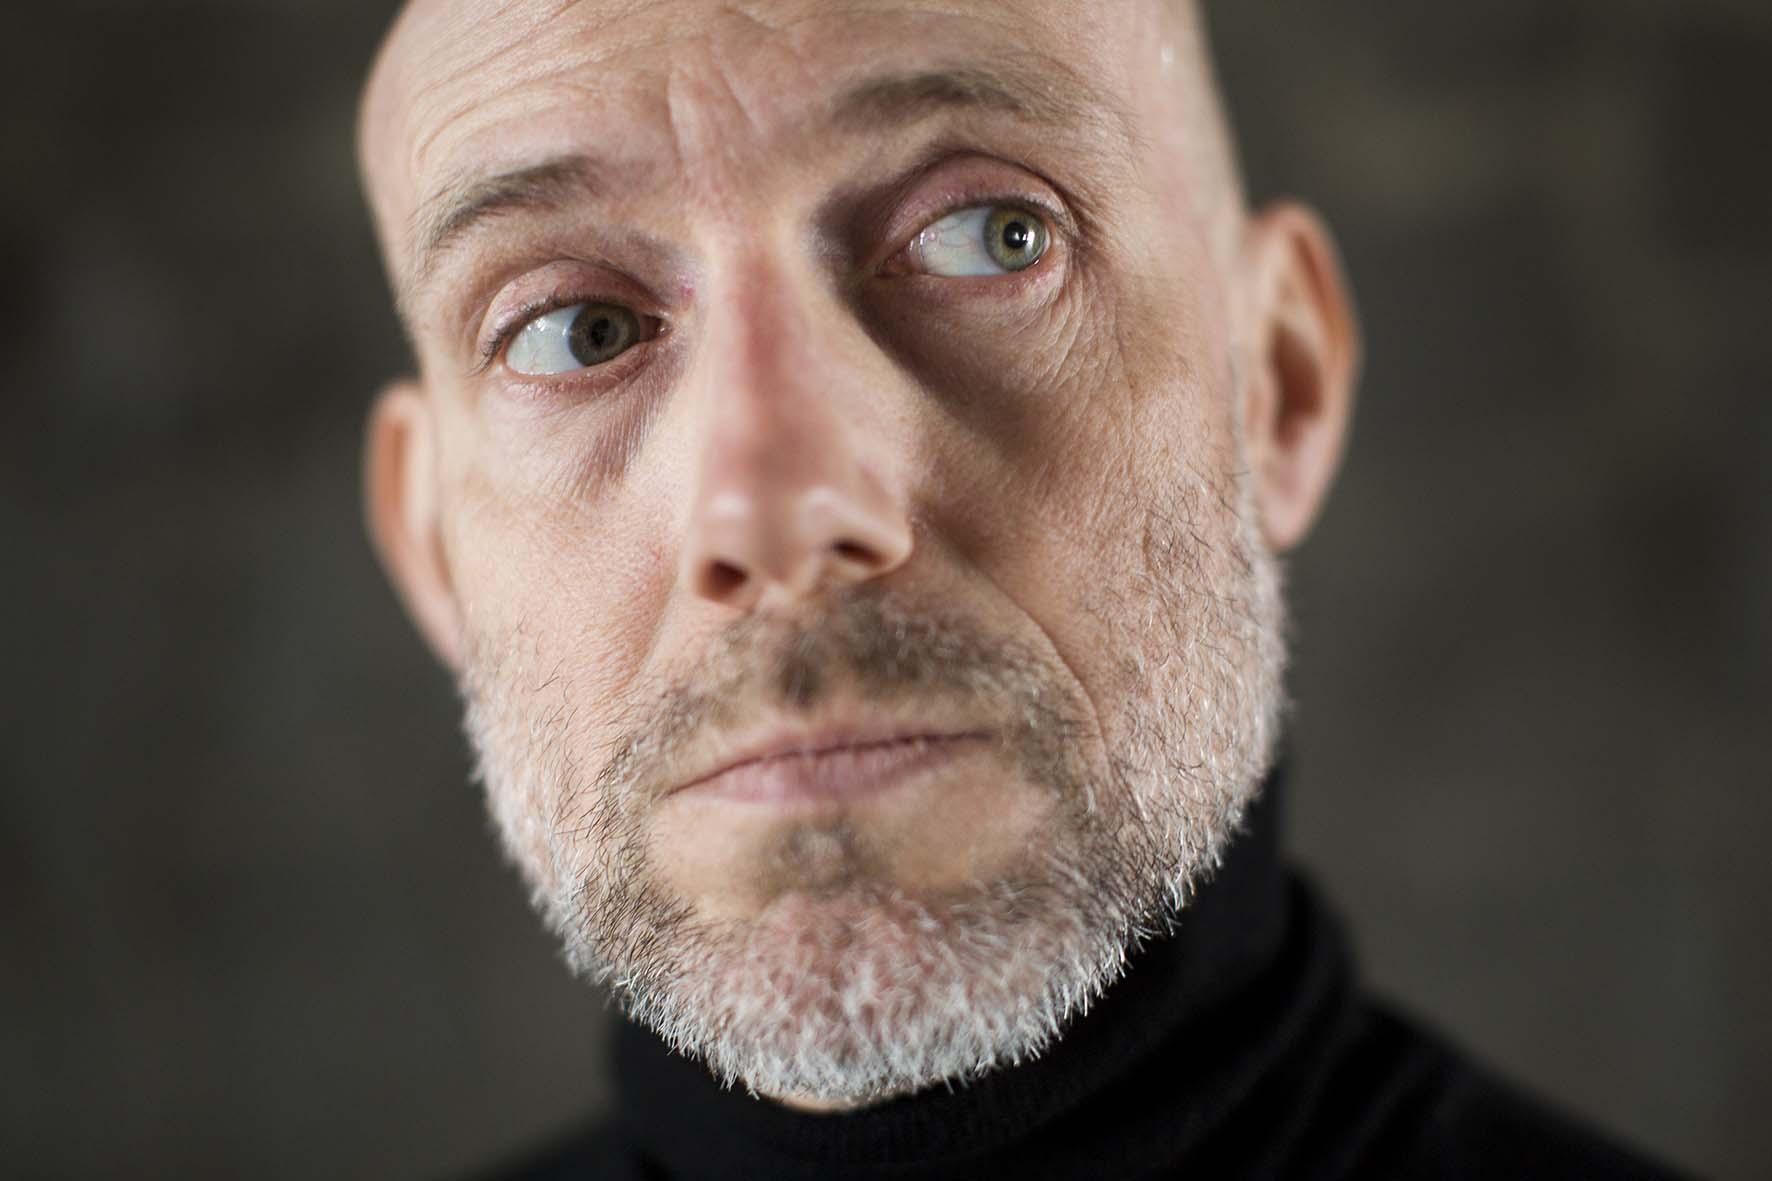 Portret Martin | Openheid over depressie op allesgoed.org